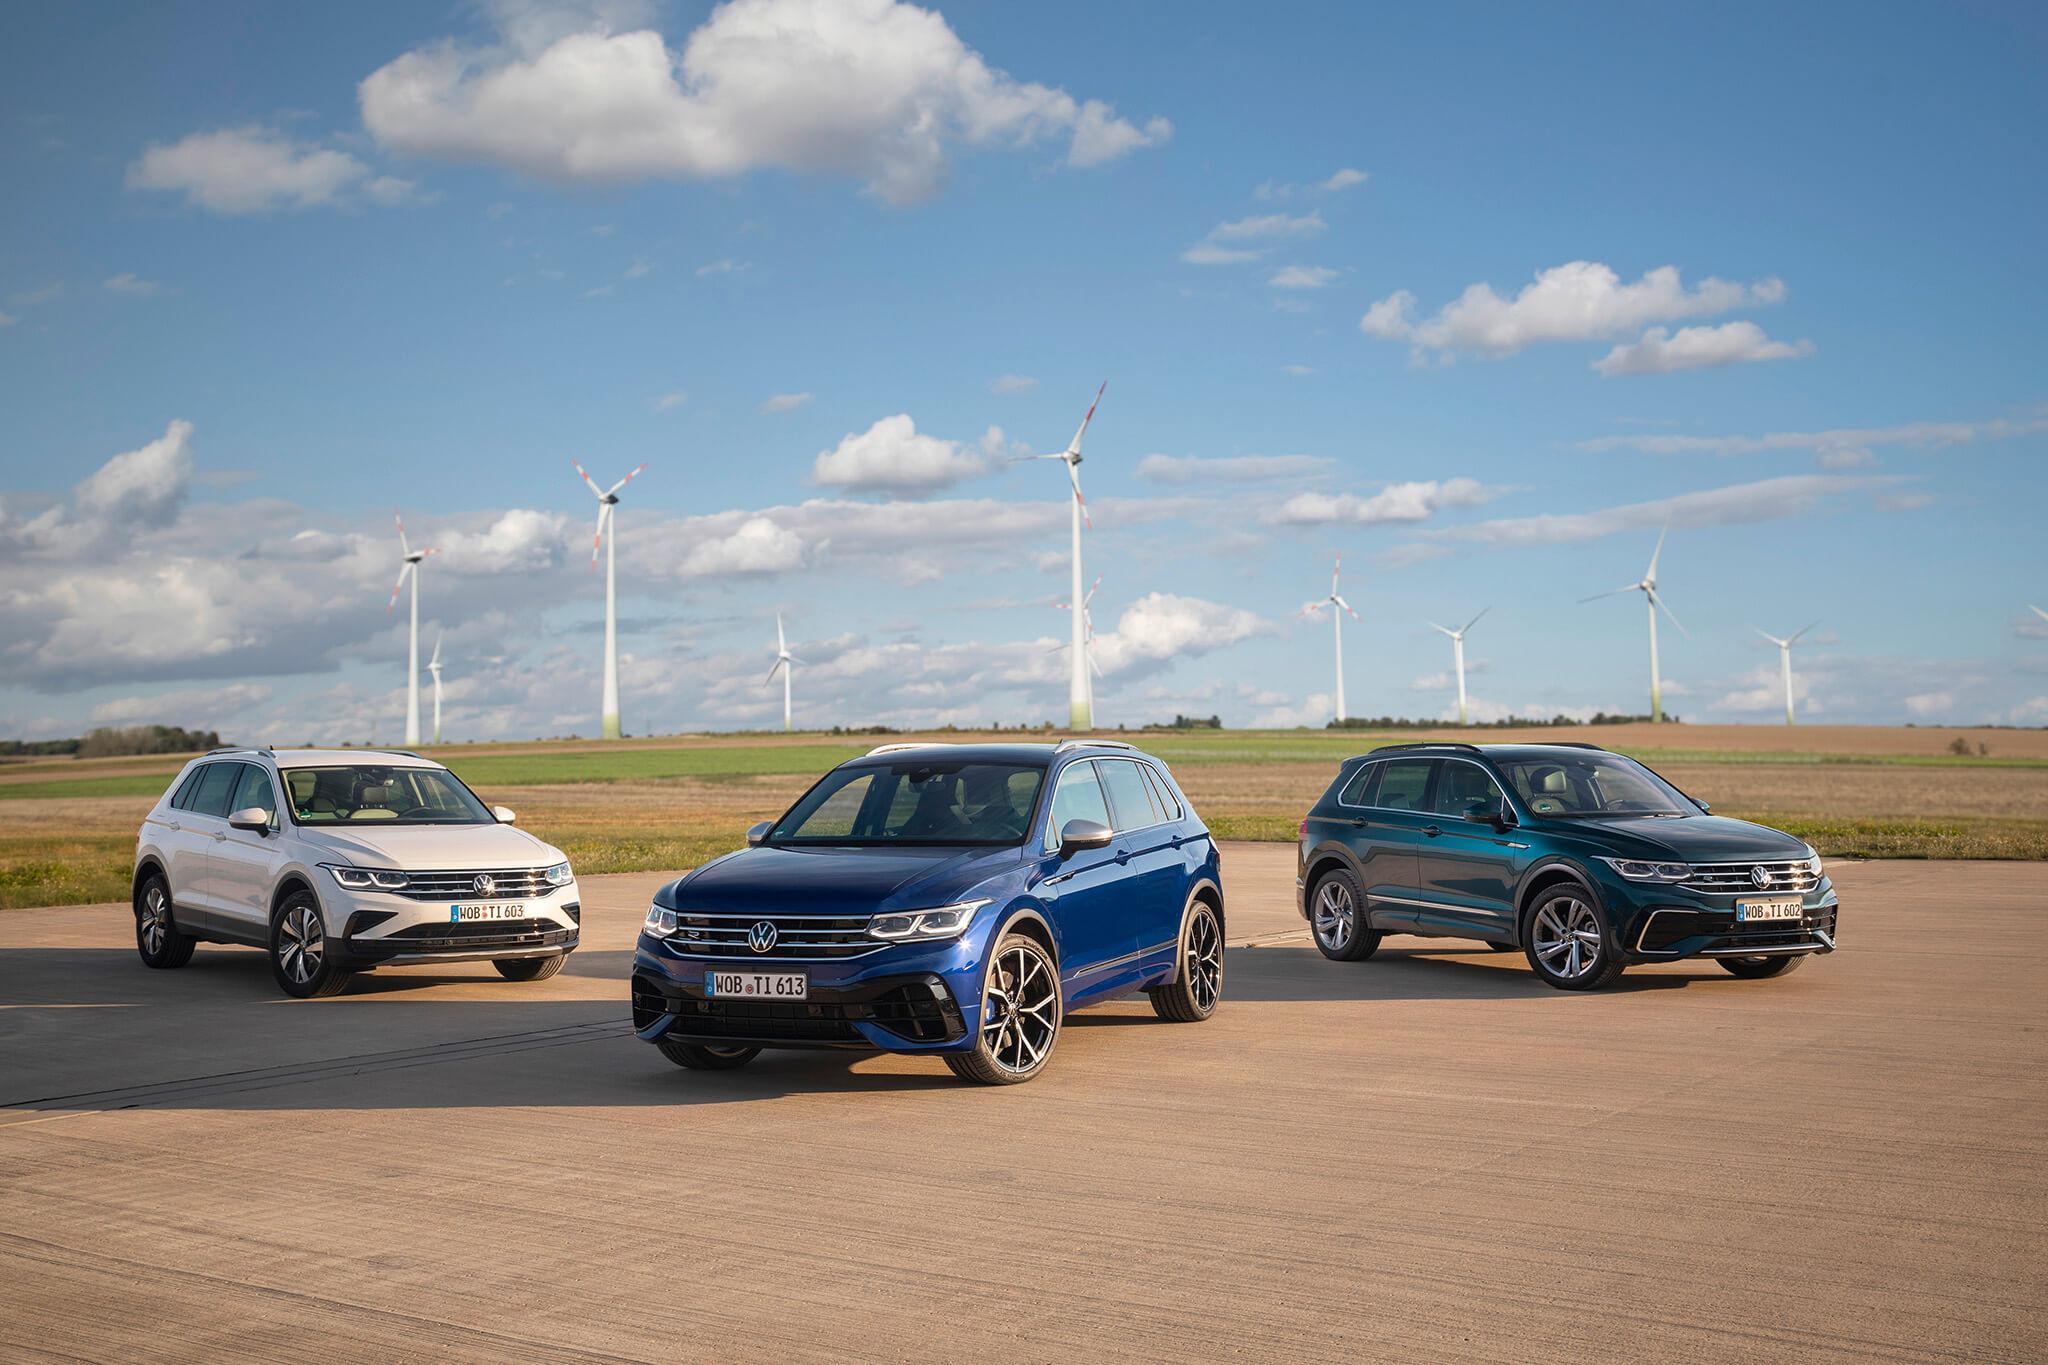 Gamme Volkswagen Tiguan renouvelée